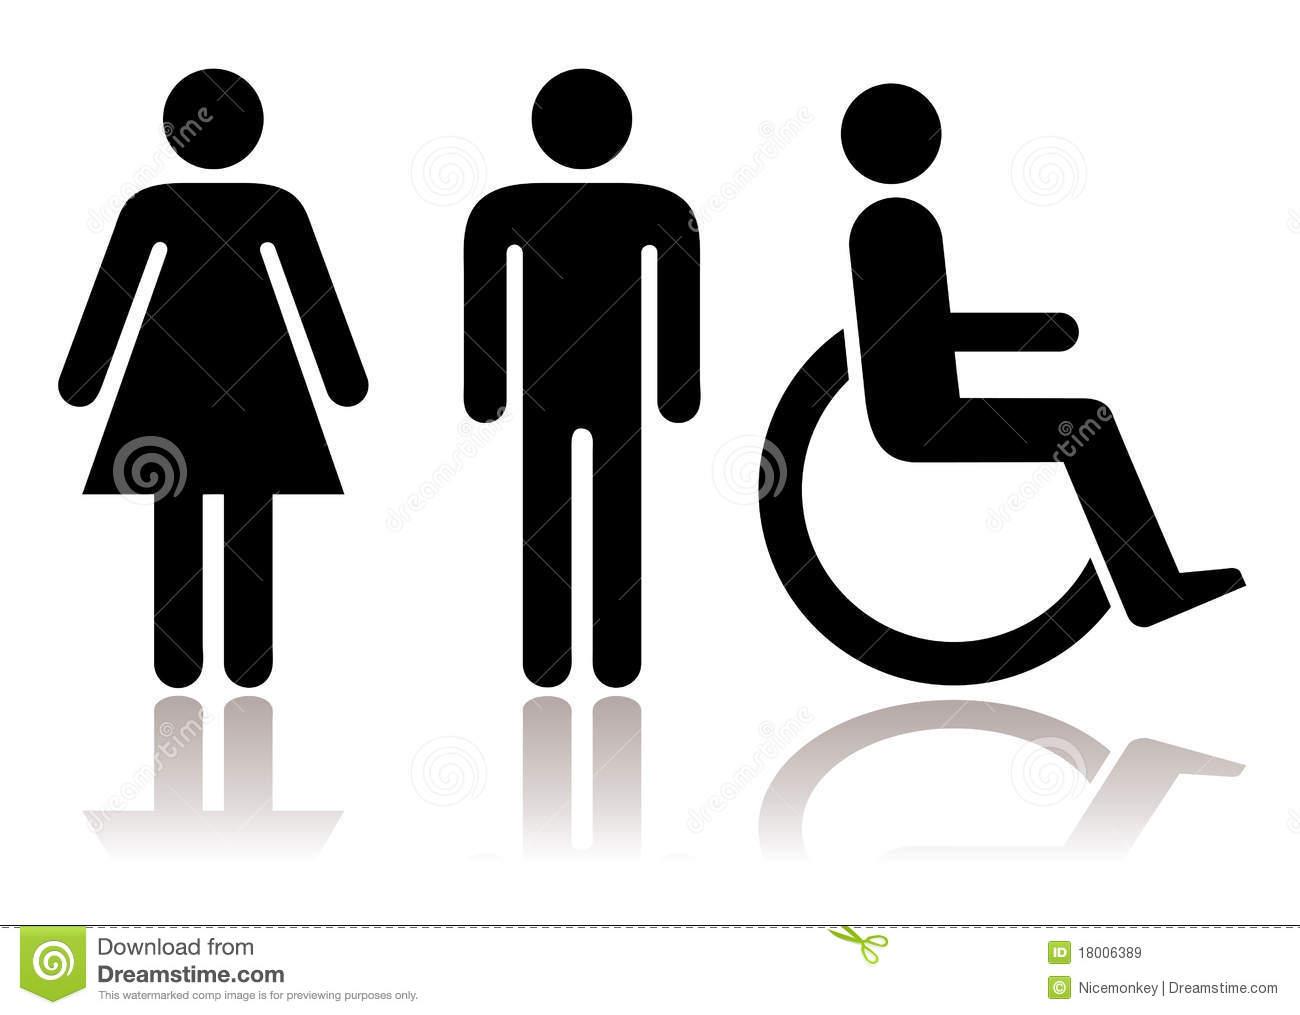 Toilettensymbole Abgeschalten Stock Abbildung tout Toilettes Handicapés